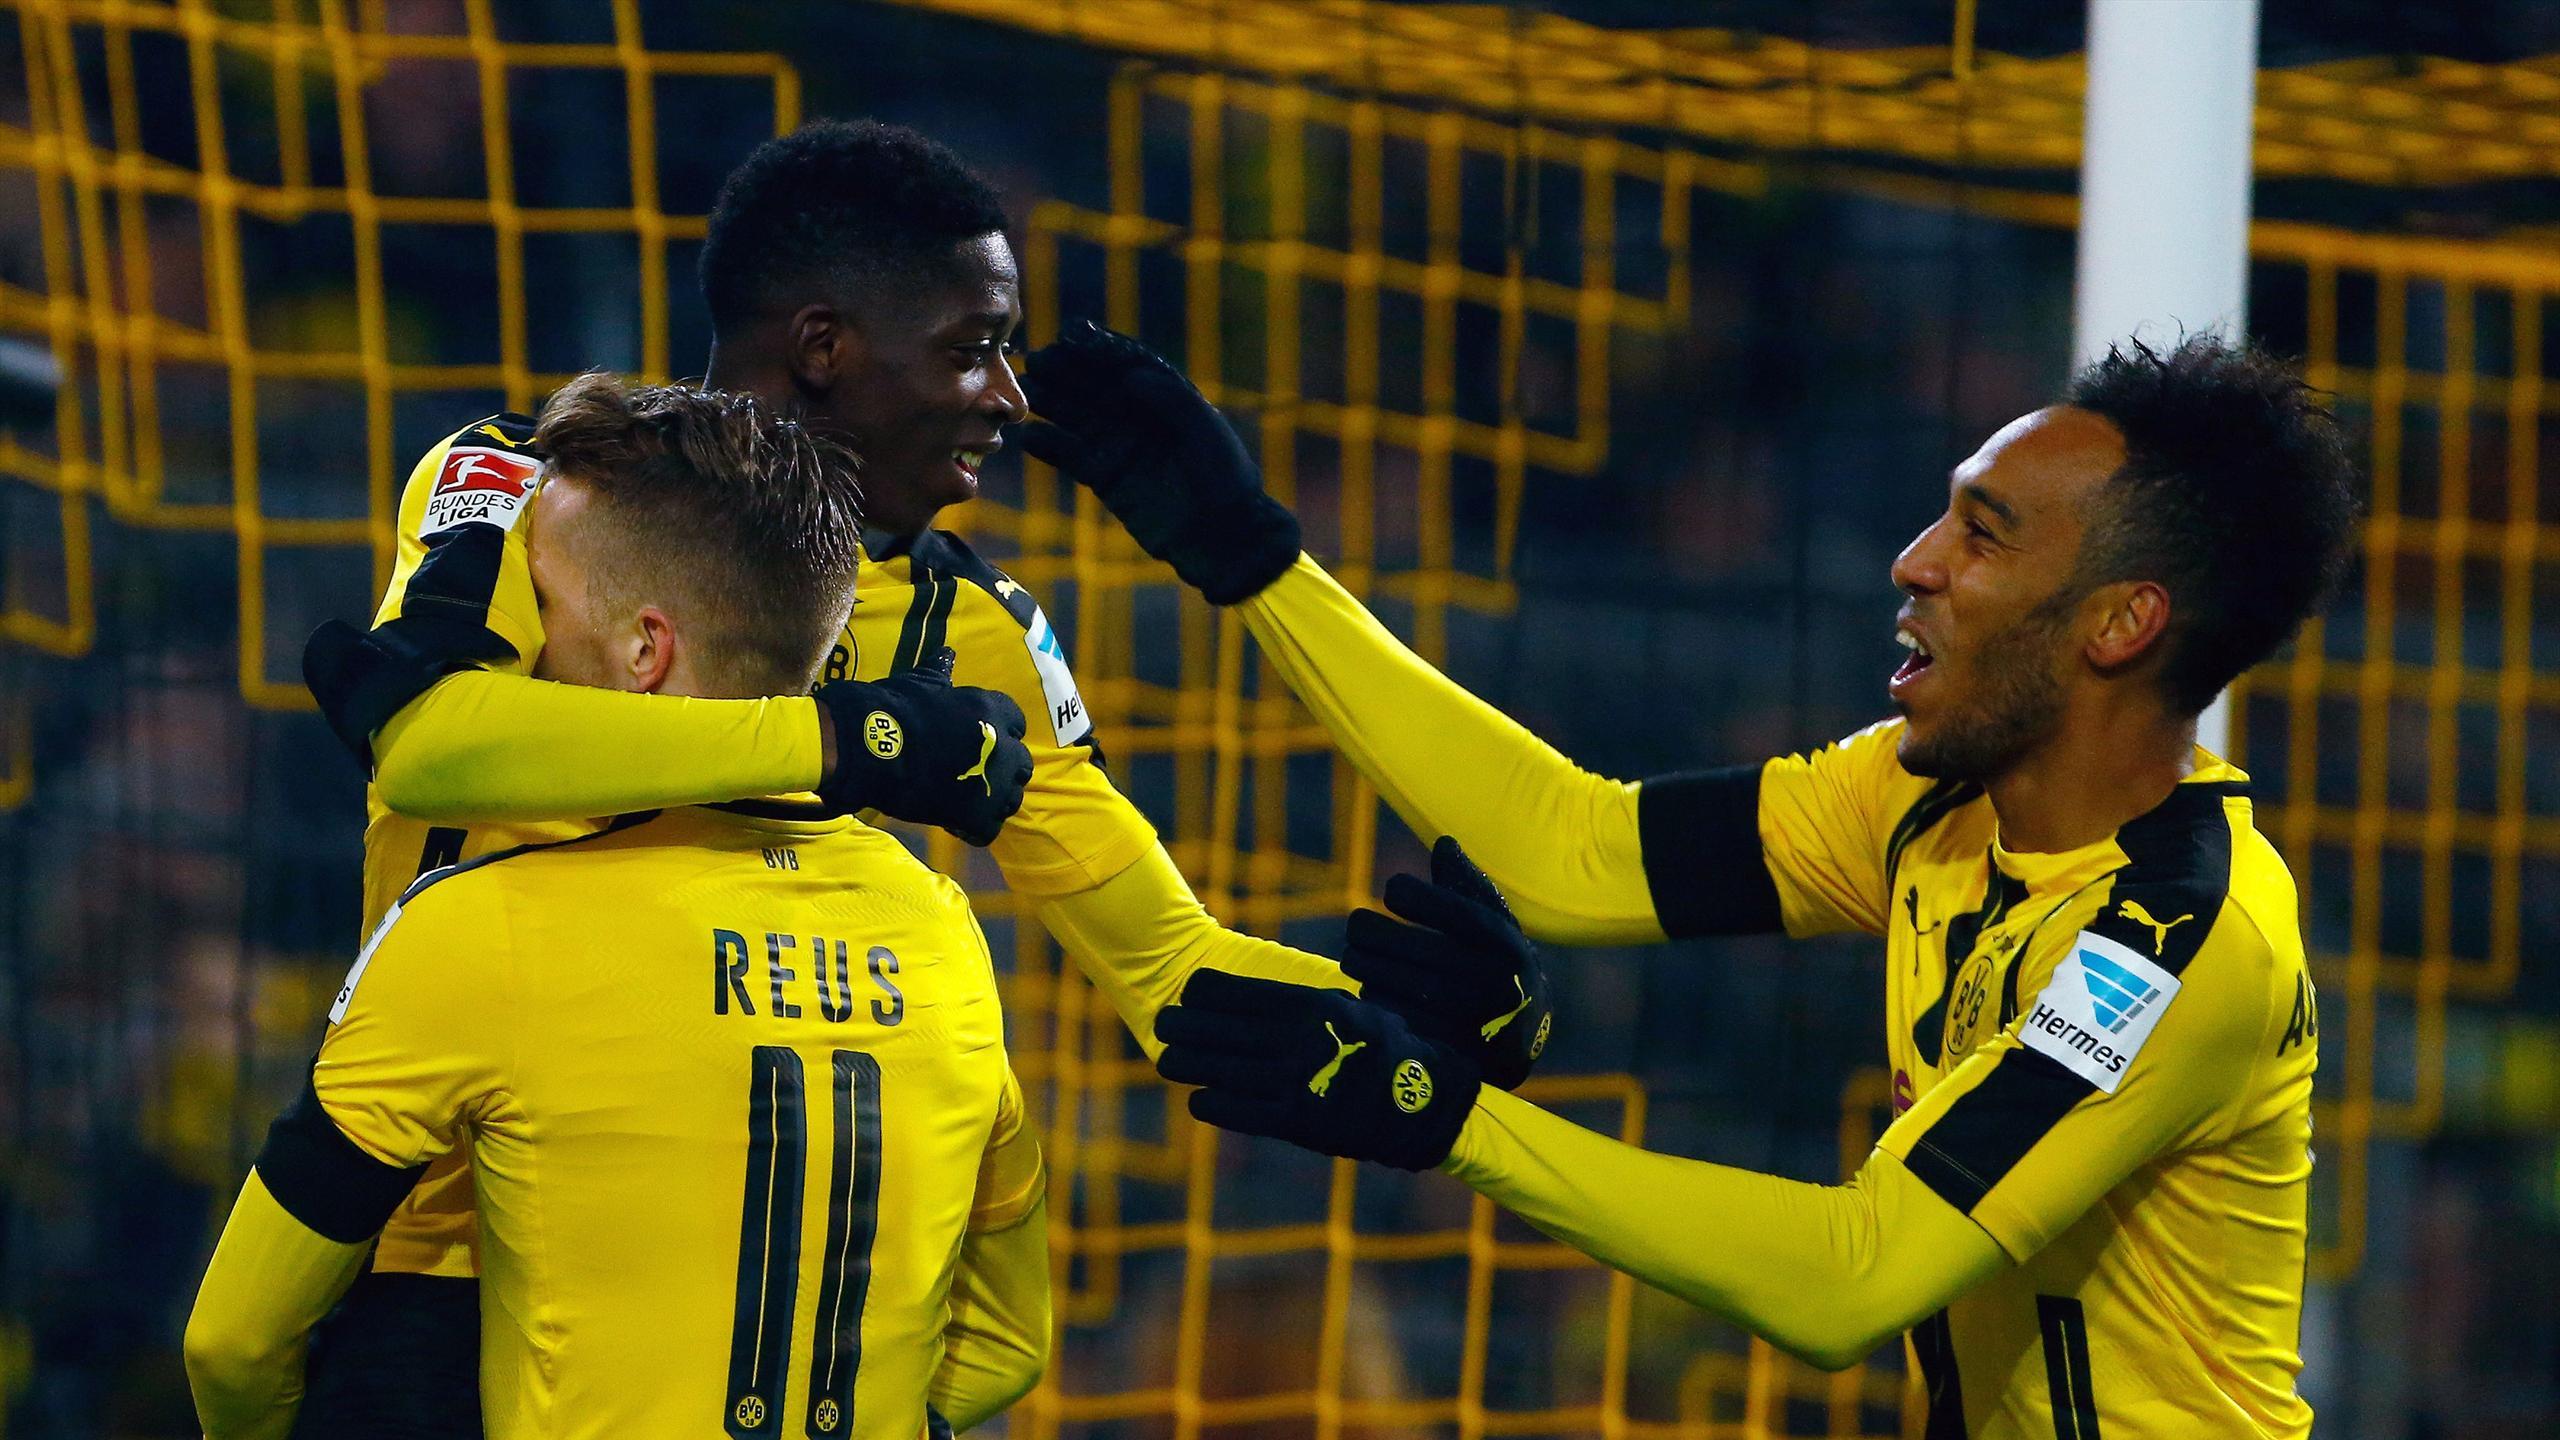 Borussia Dortmund stars Aubameyang, Reus and Dembele